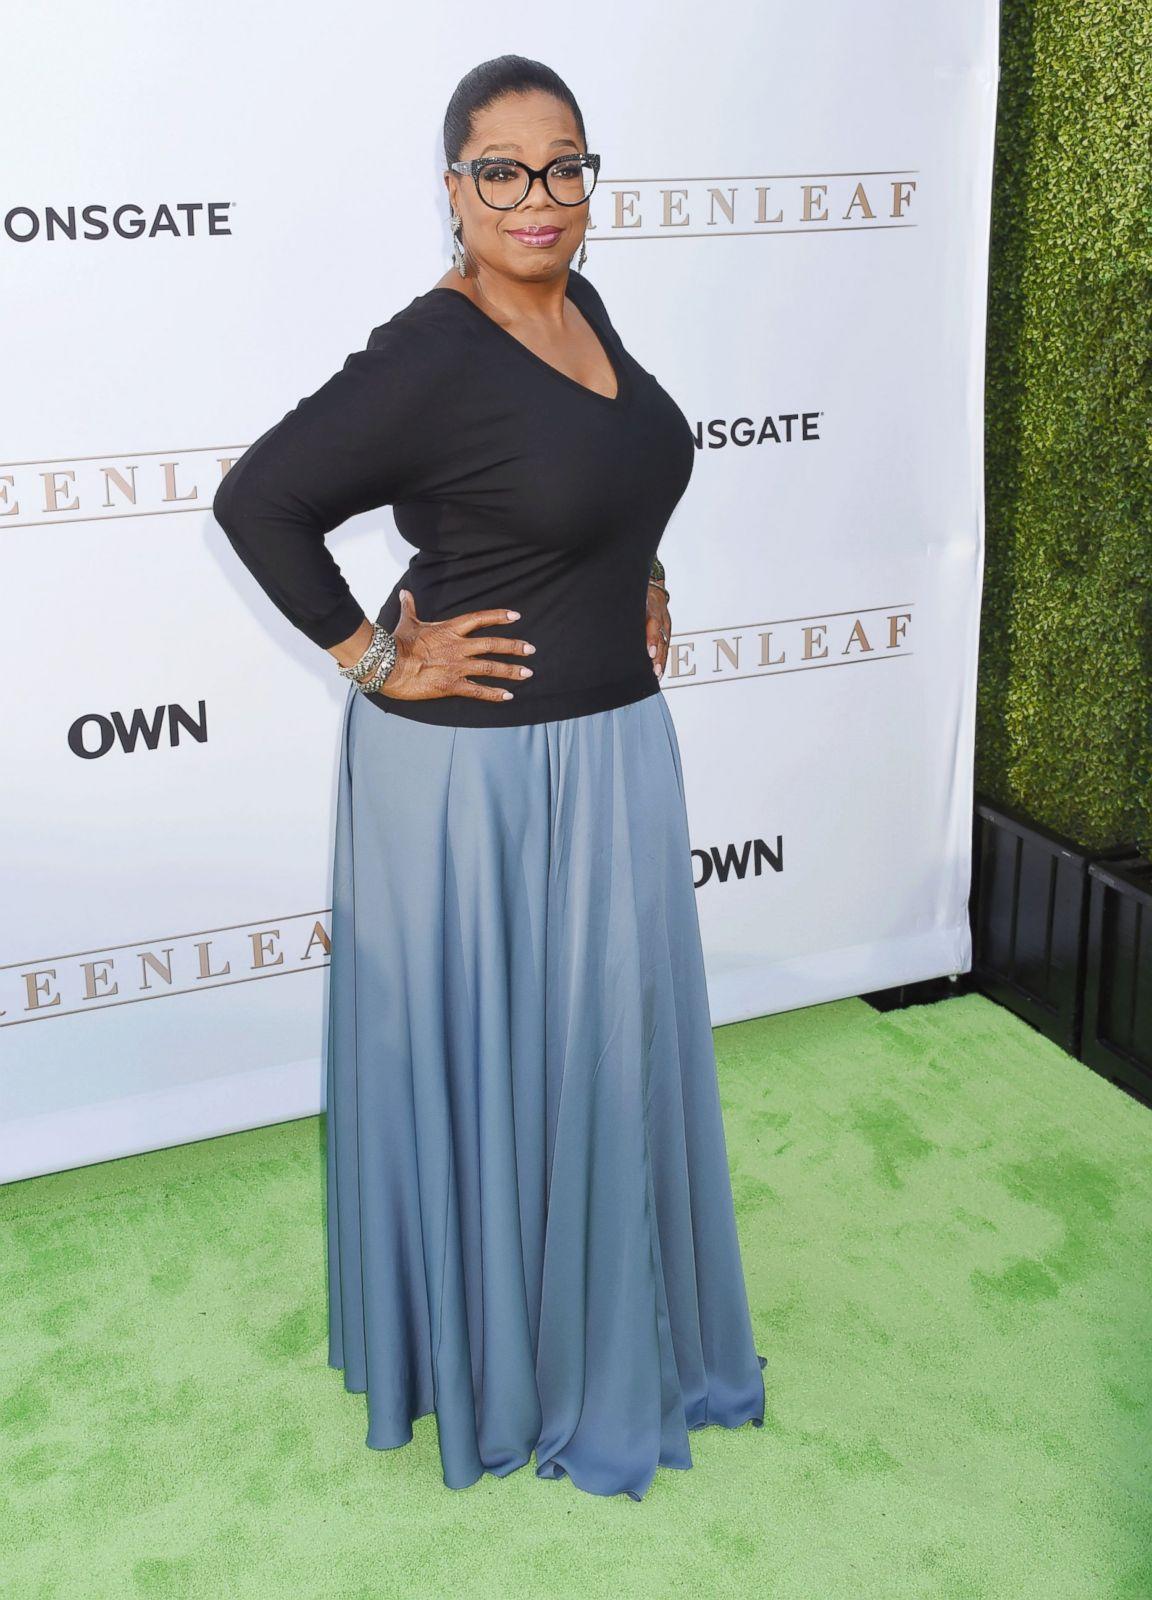 ae187cd57b3f Oprah Winfrey Through the Years Photos - ABC News